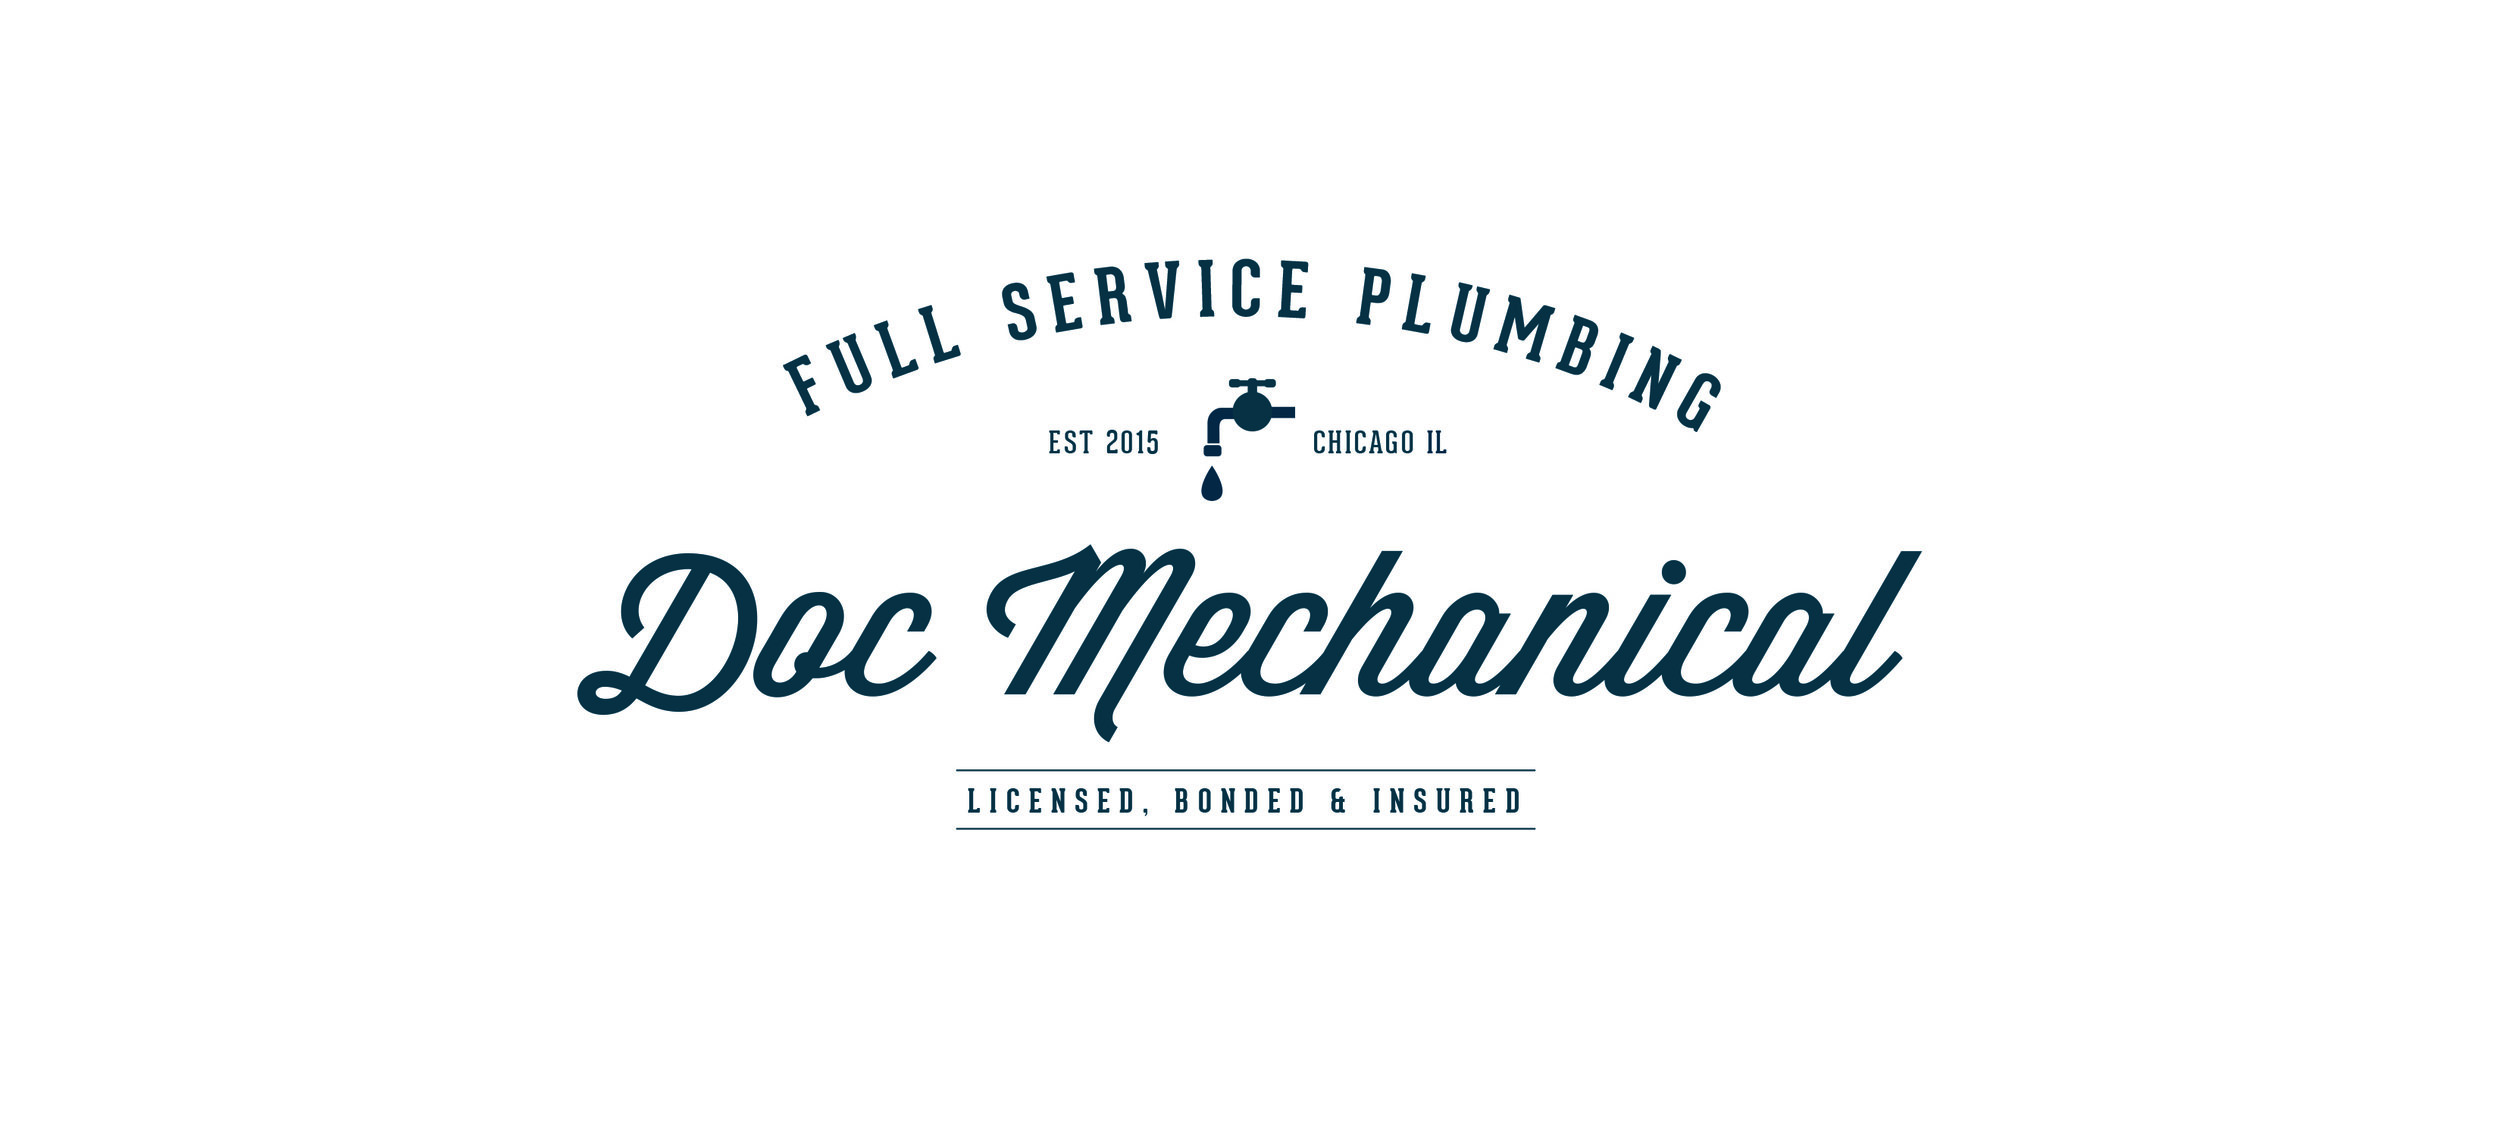 DOCMechanical_Logo_OneColor_03262018.jpg